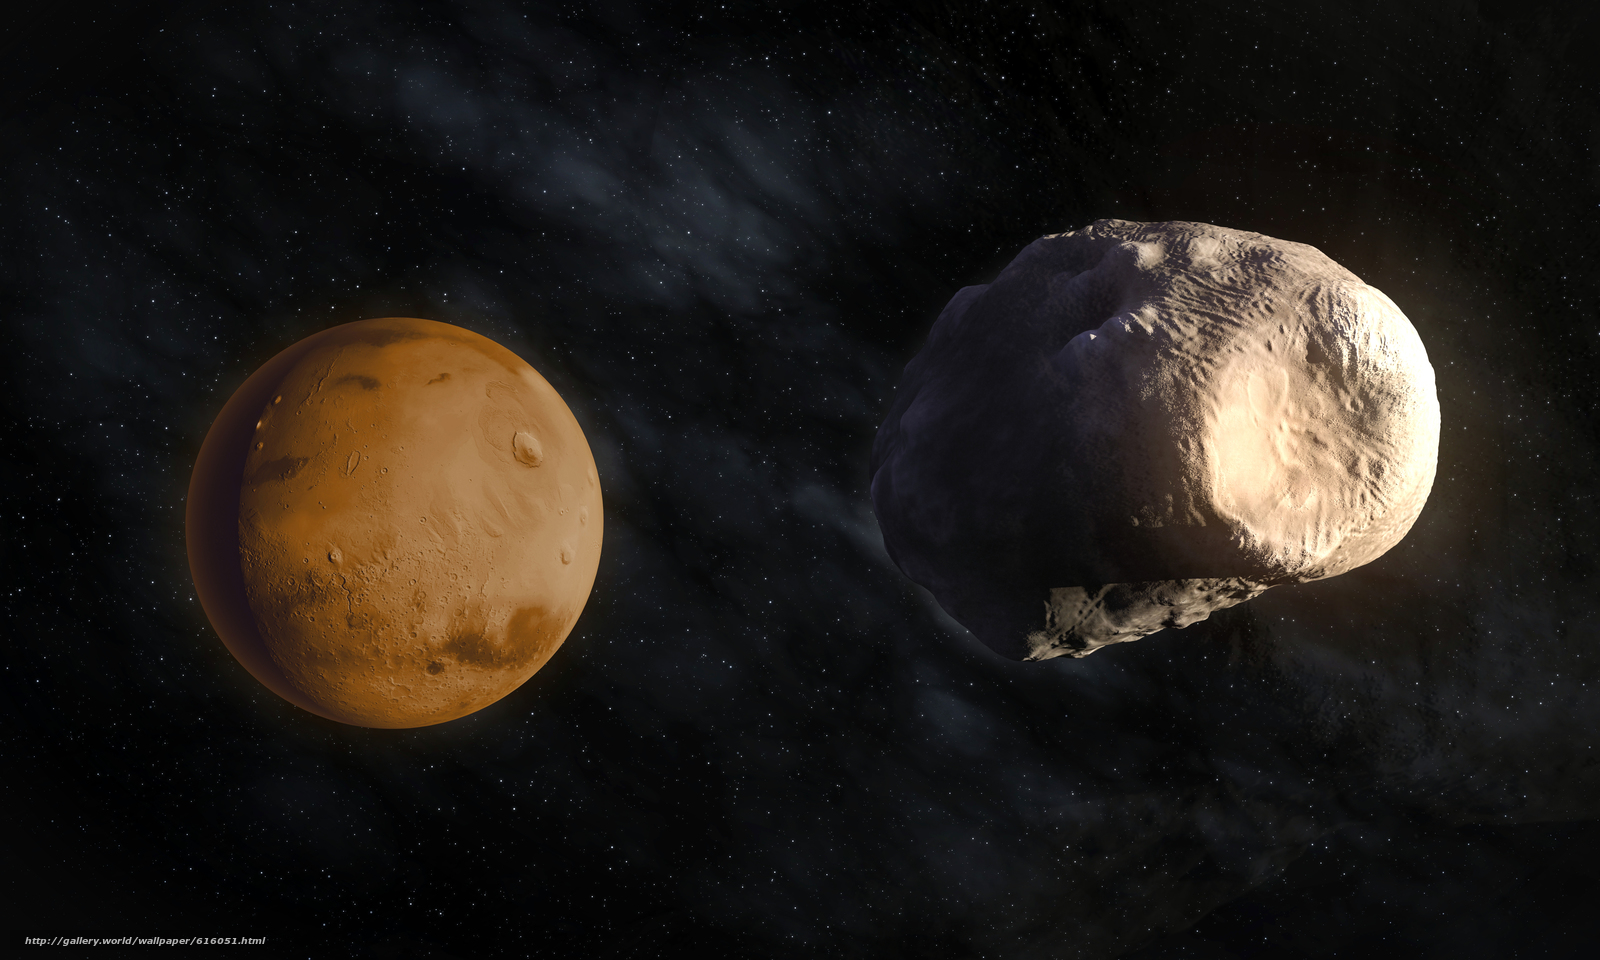 mars moons diameter - HD2560×1440